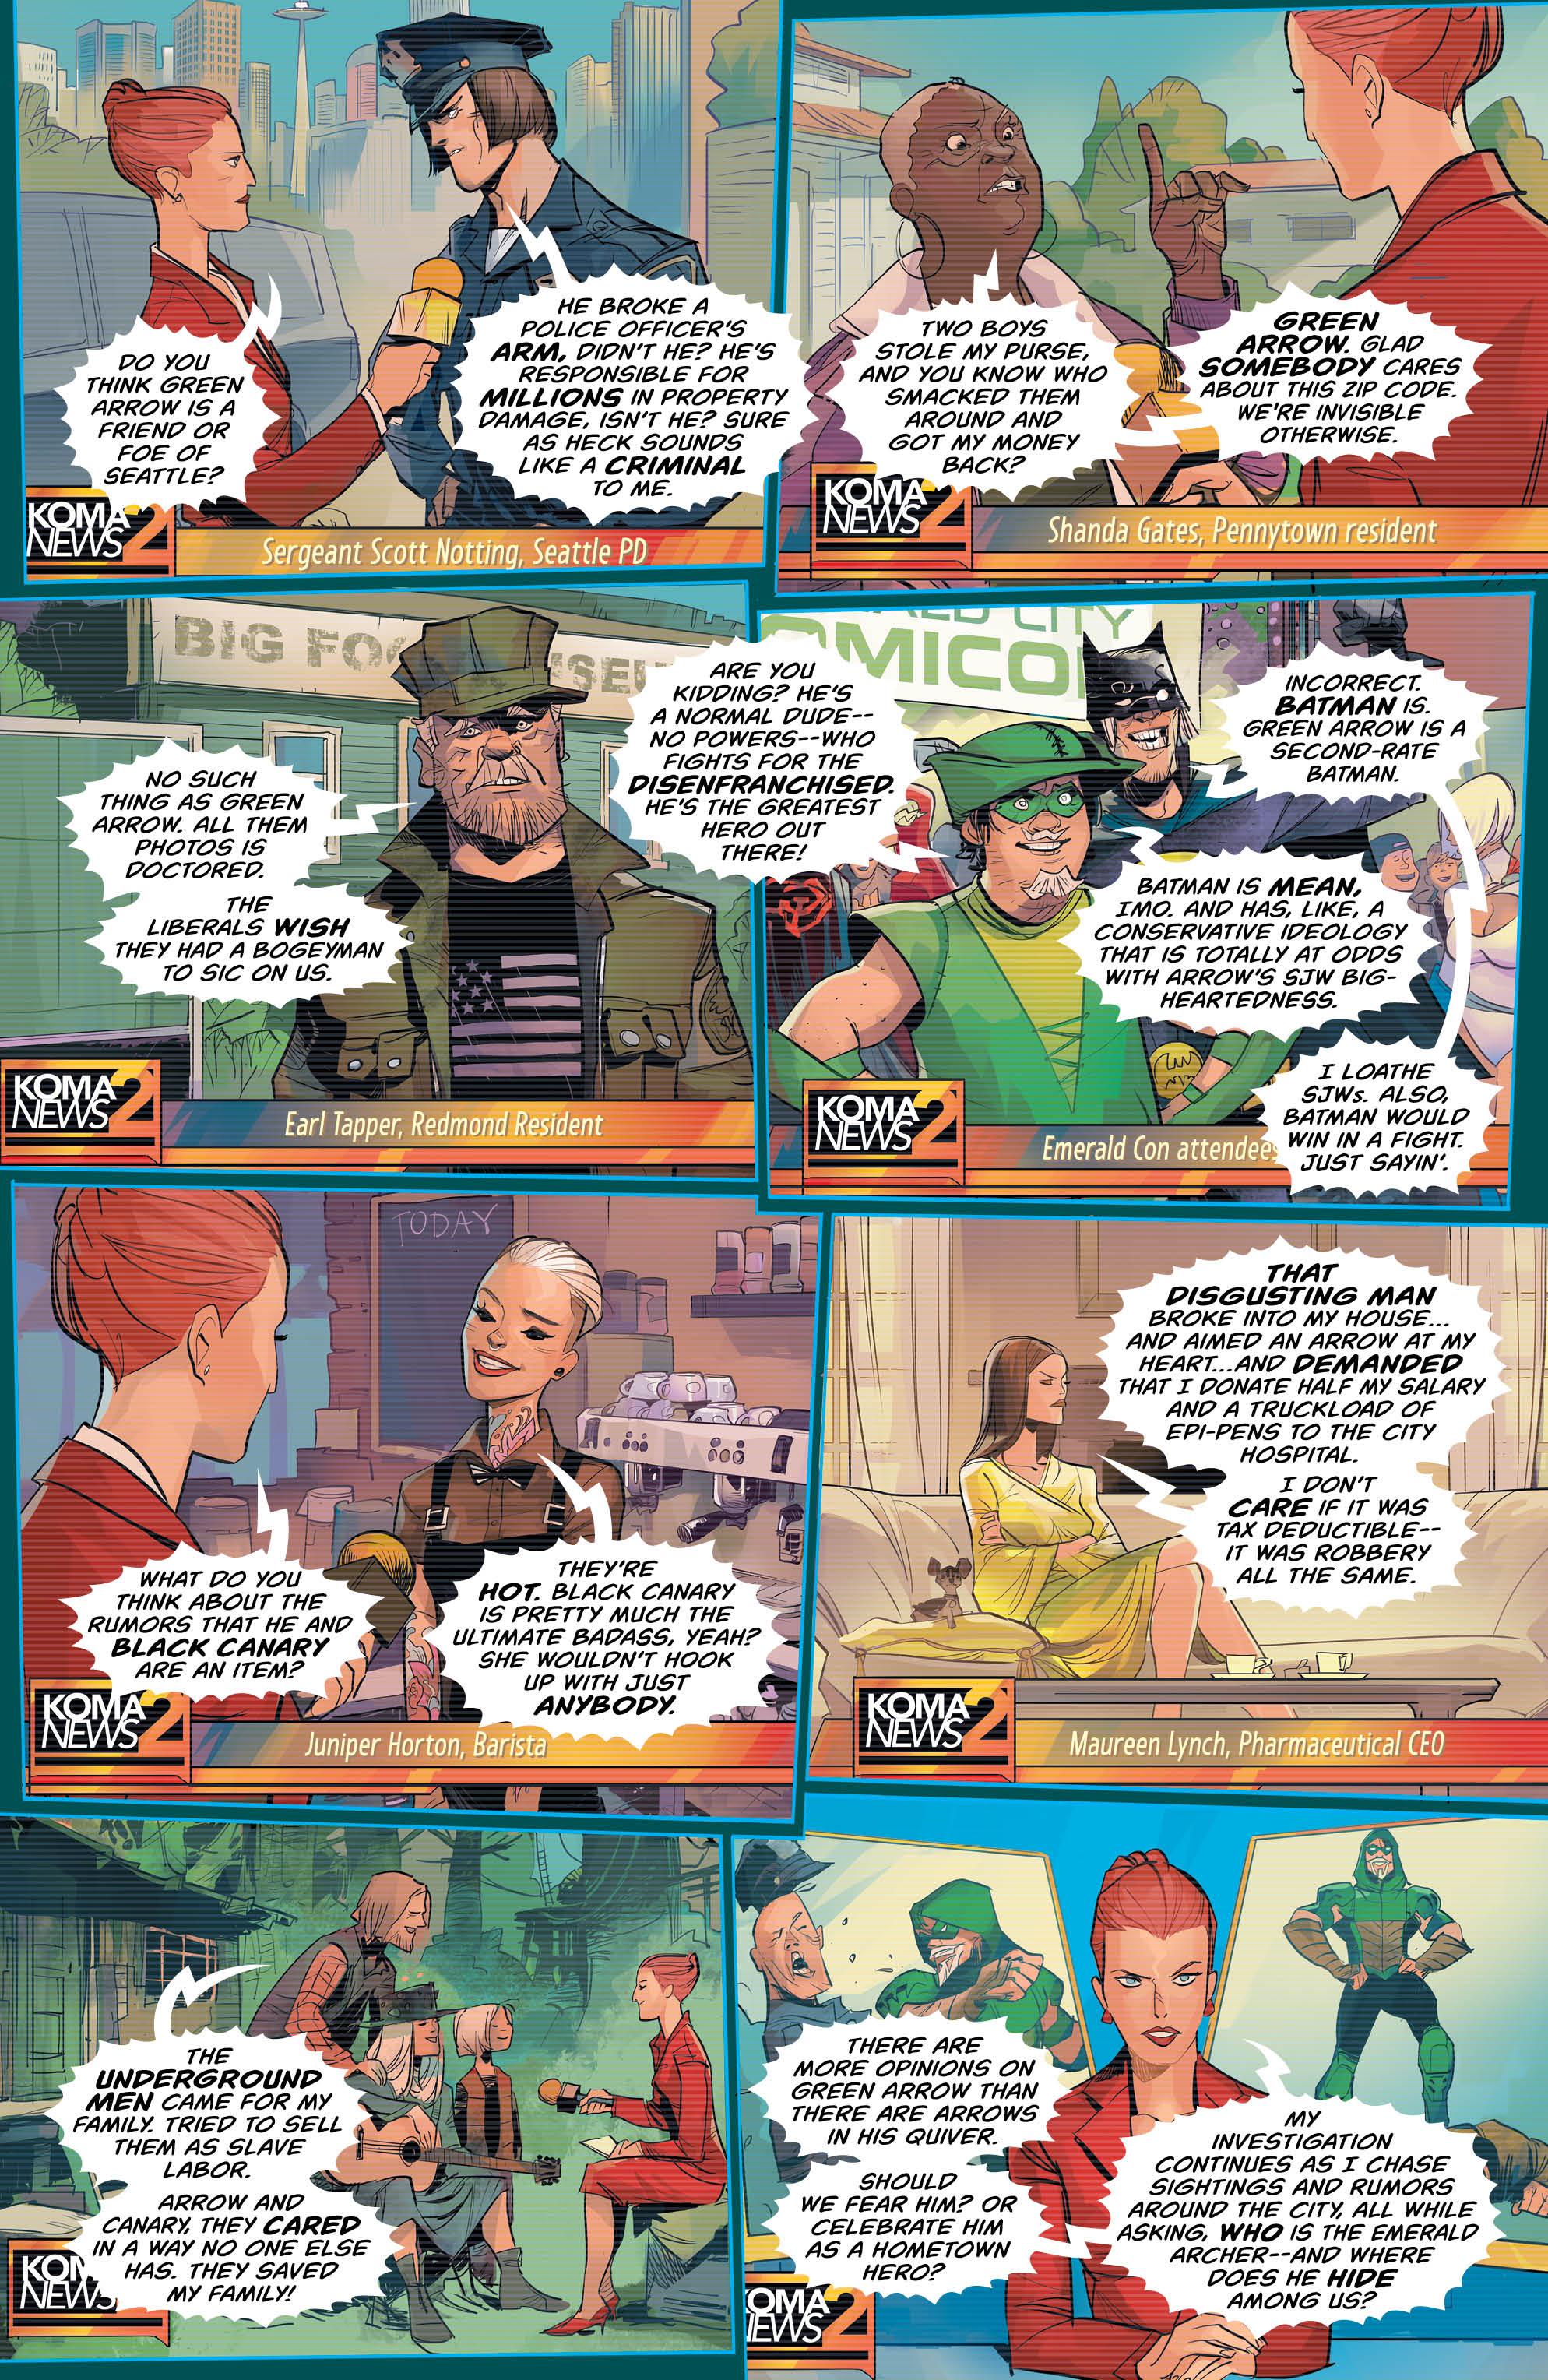 DC REBORN ROUND-UP: GREEN ARROW and NIGHTWING Undergo New